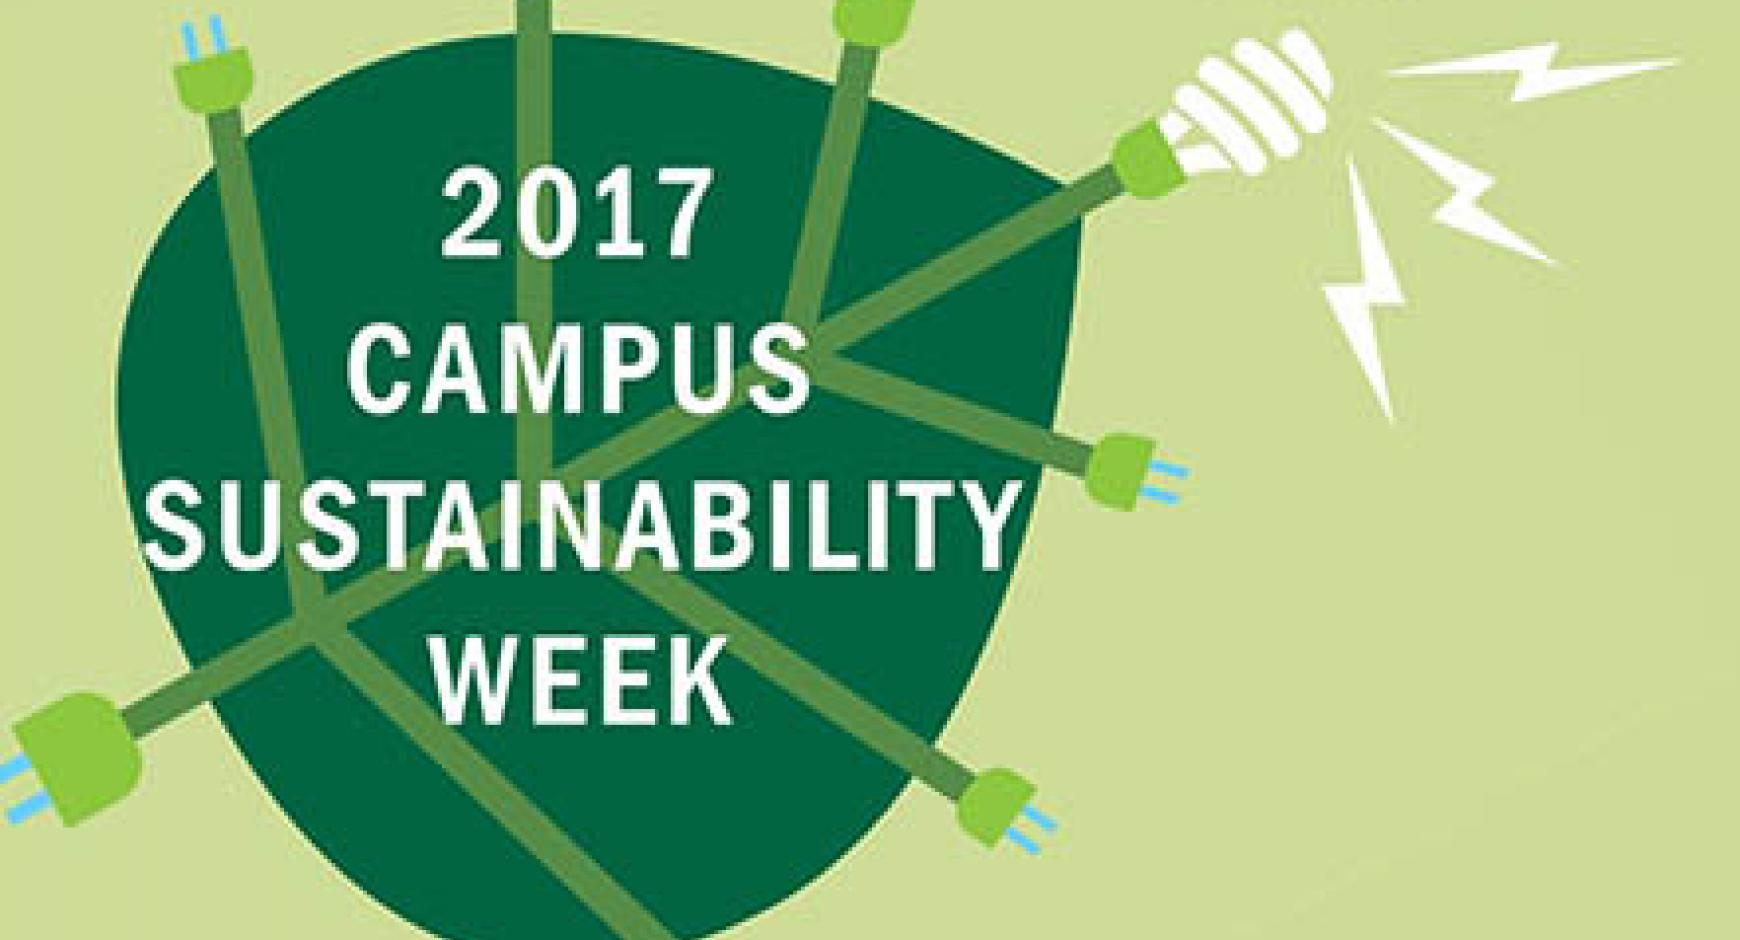 2017 Campus Sustainability Week